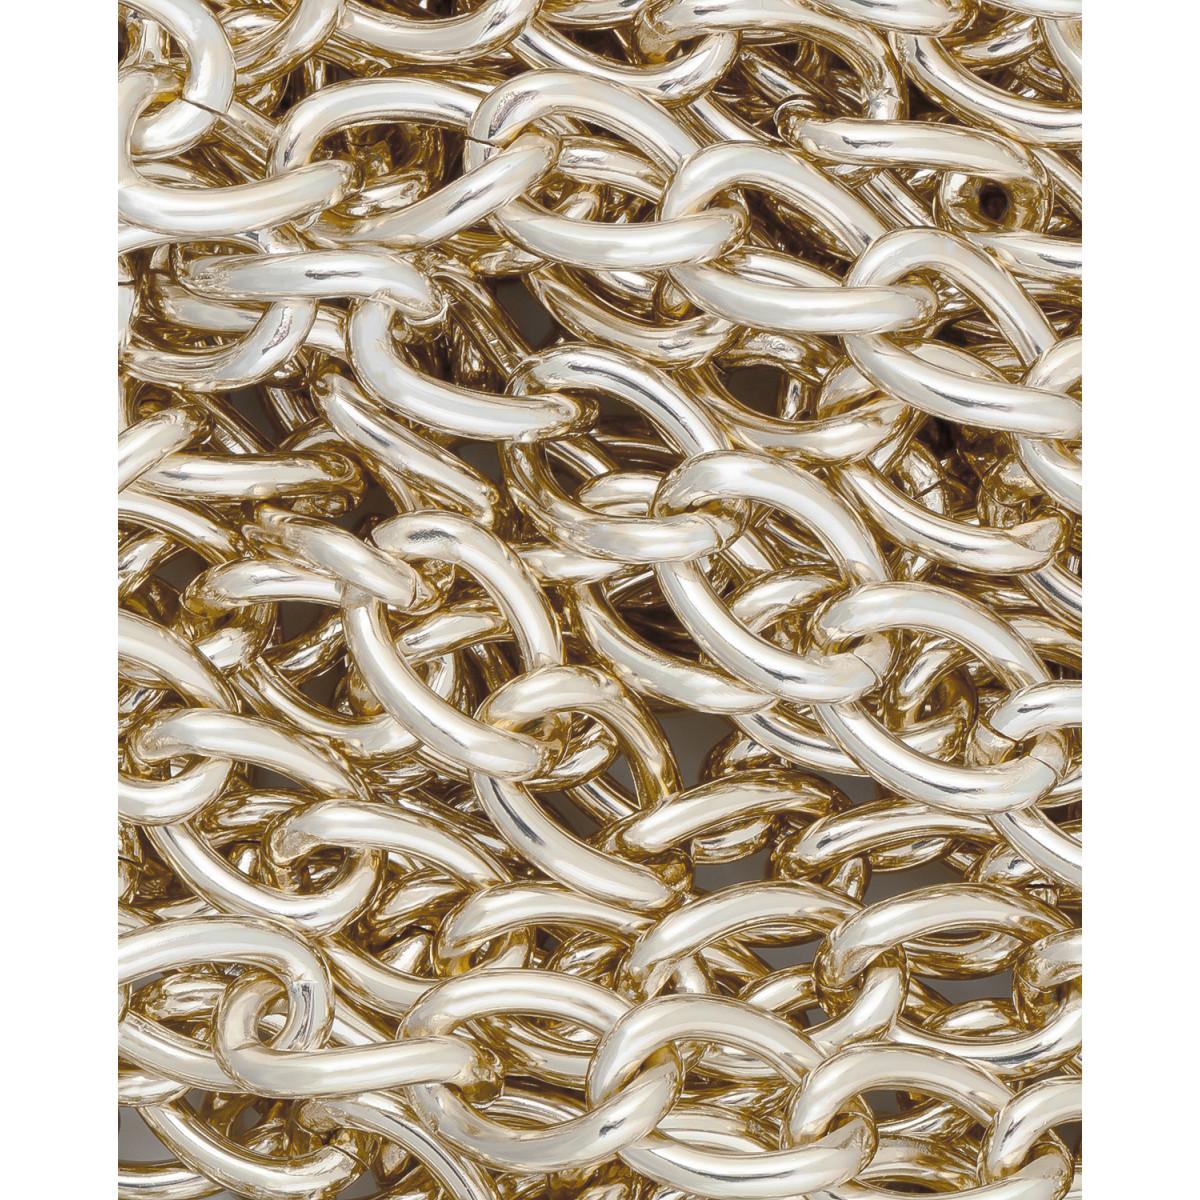 Цепь ш.1,3 см (металл) золотистый 1м (арт. ЦМ-4-2-30314.002)